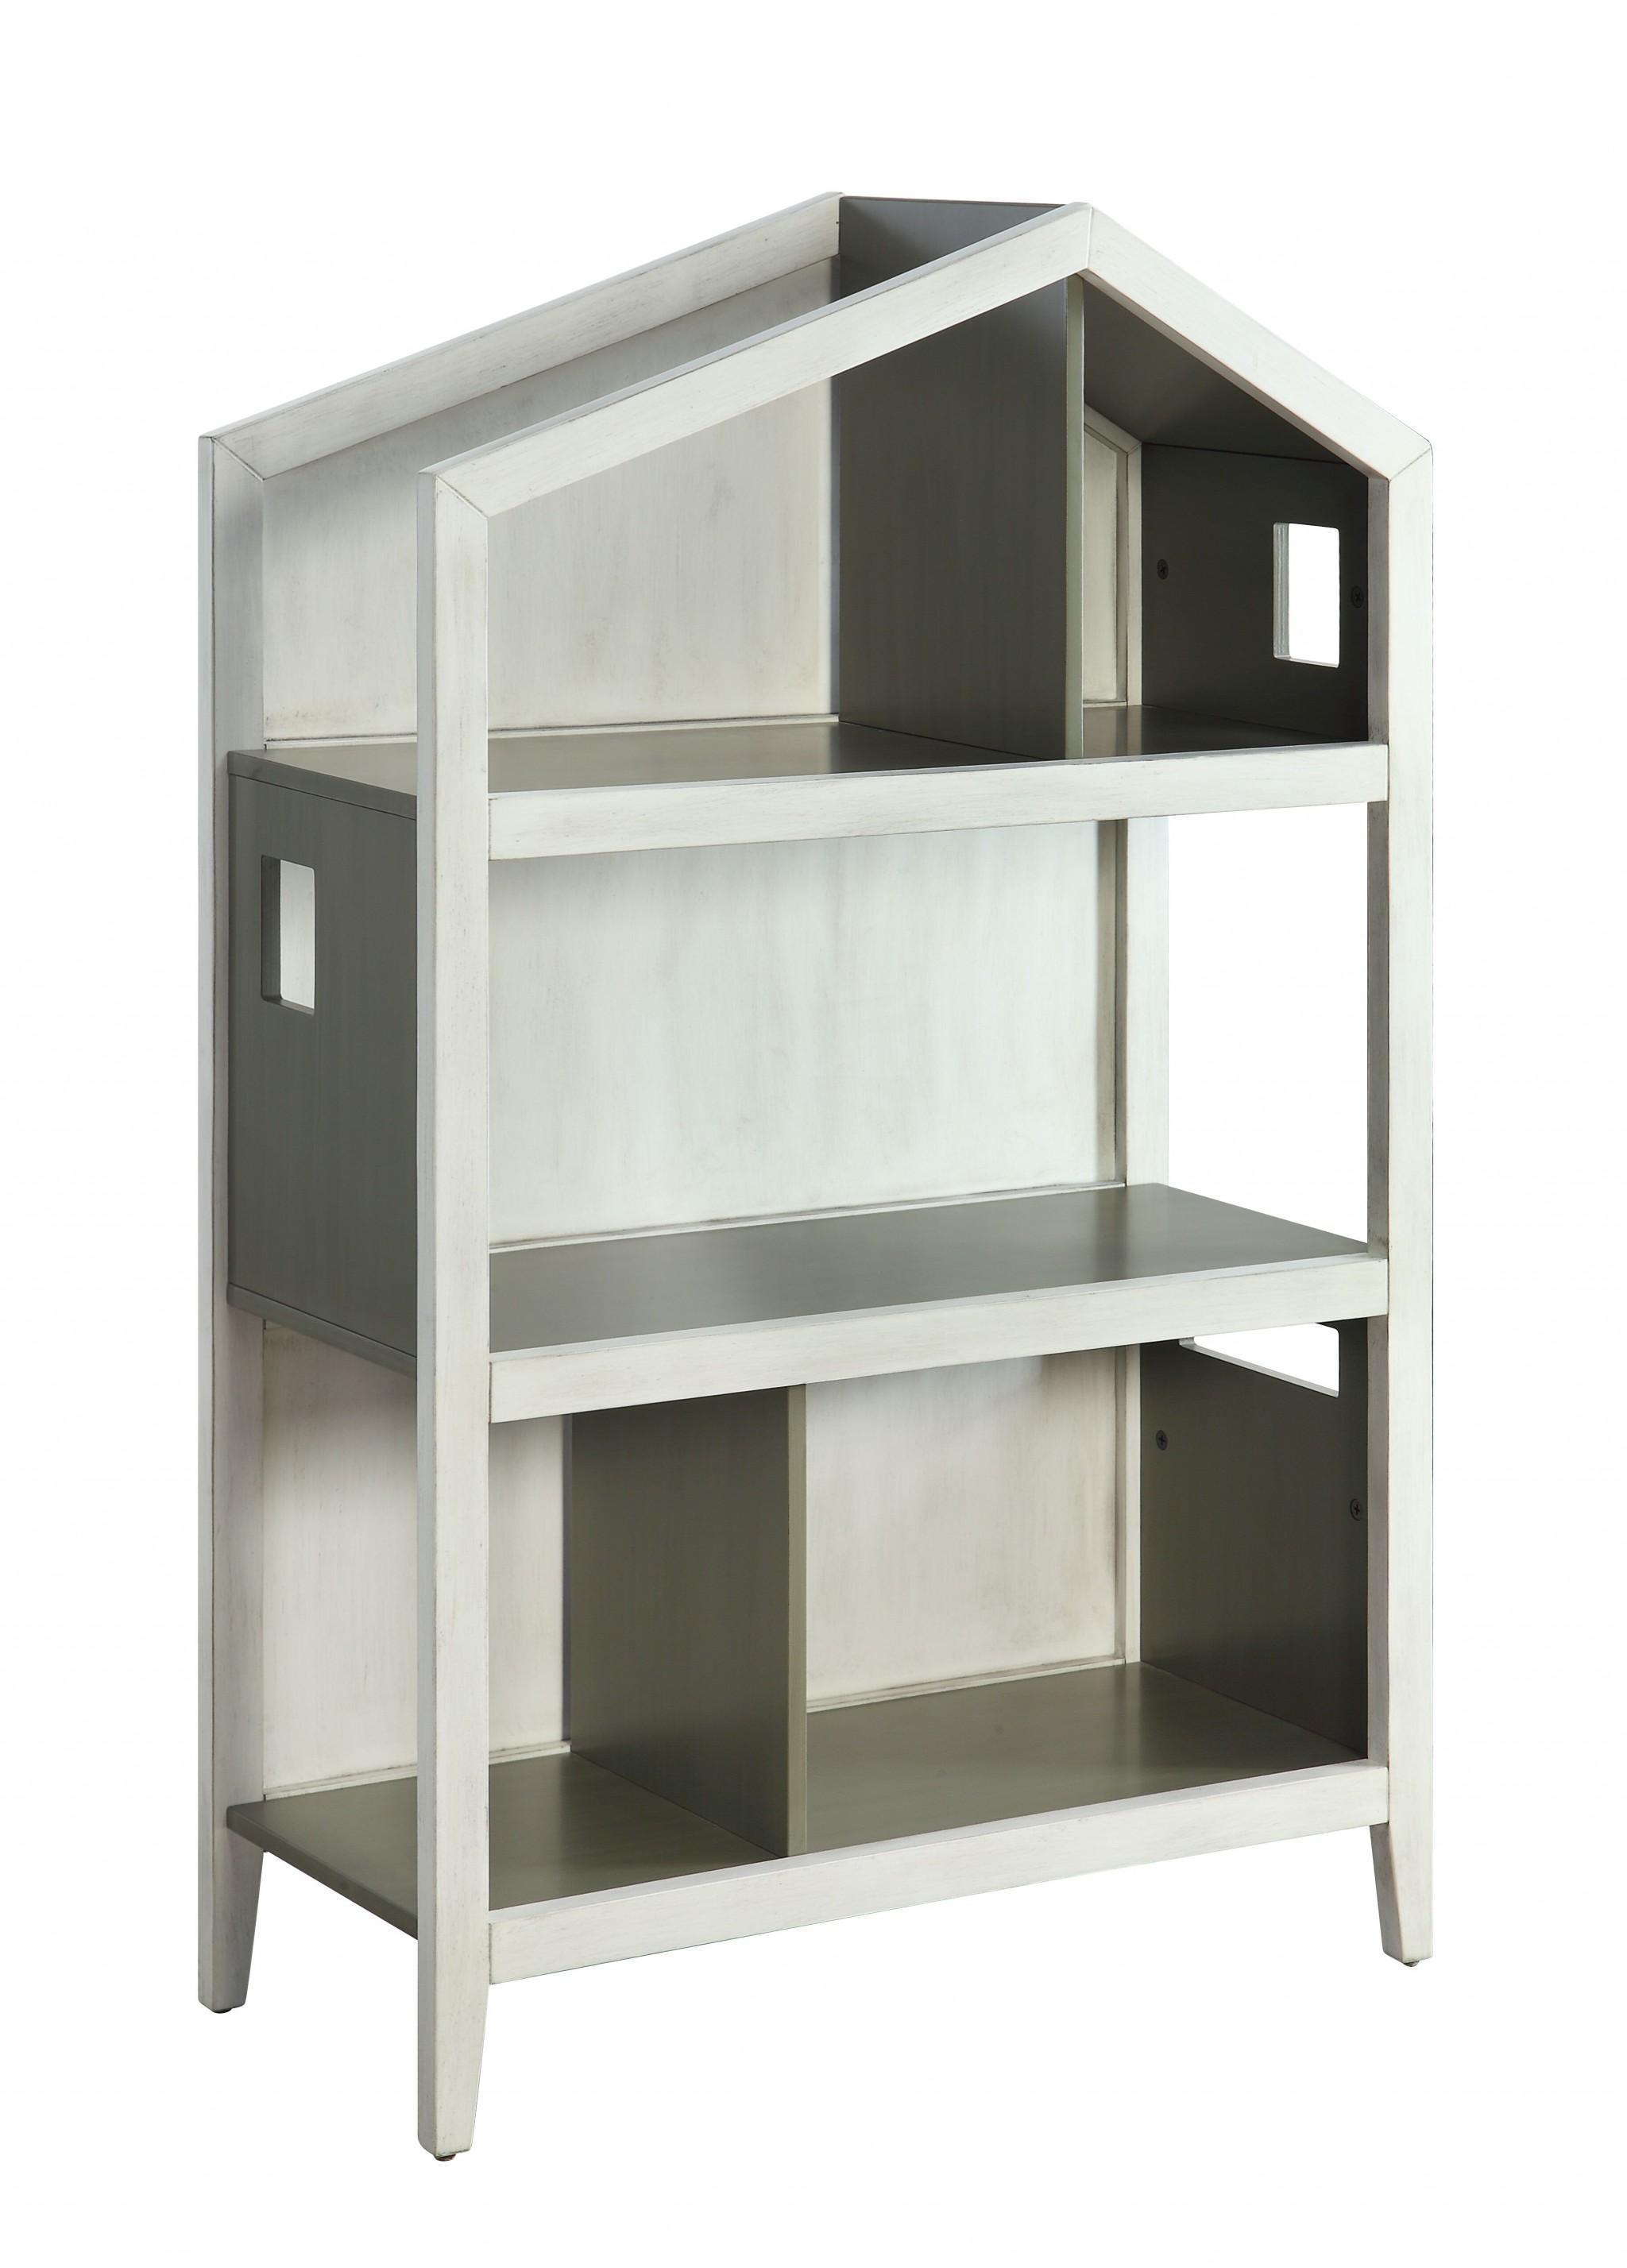 "14"" X 33"" X 50"" Weathered White Washed Gray Wood Bookcase"